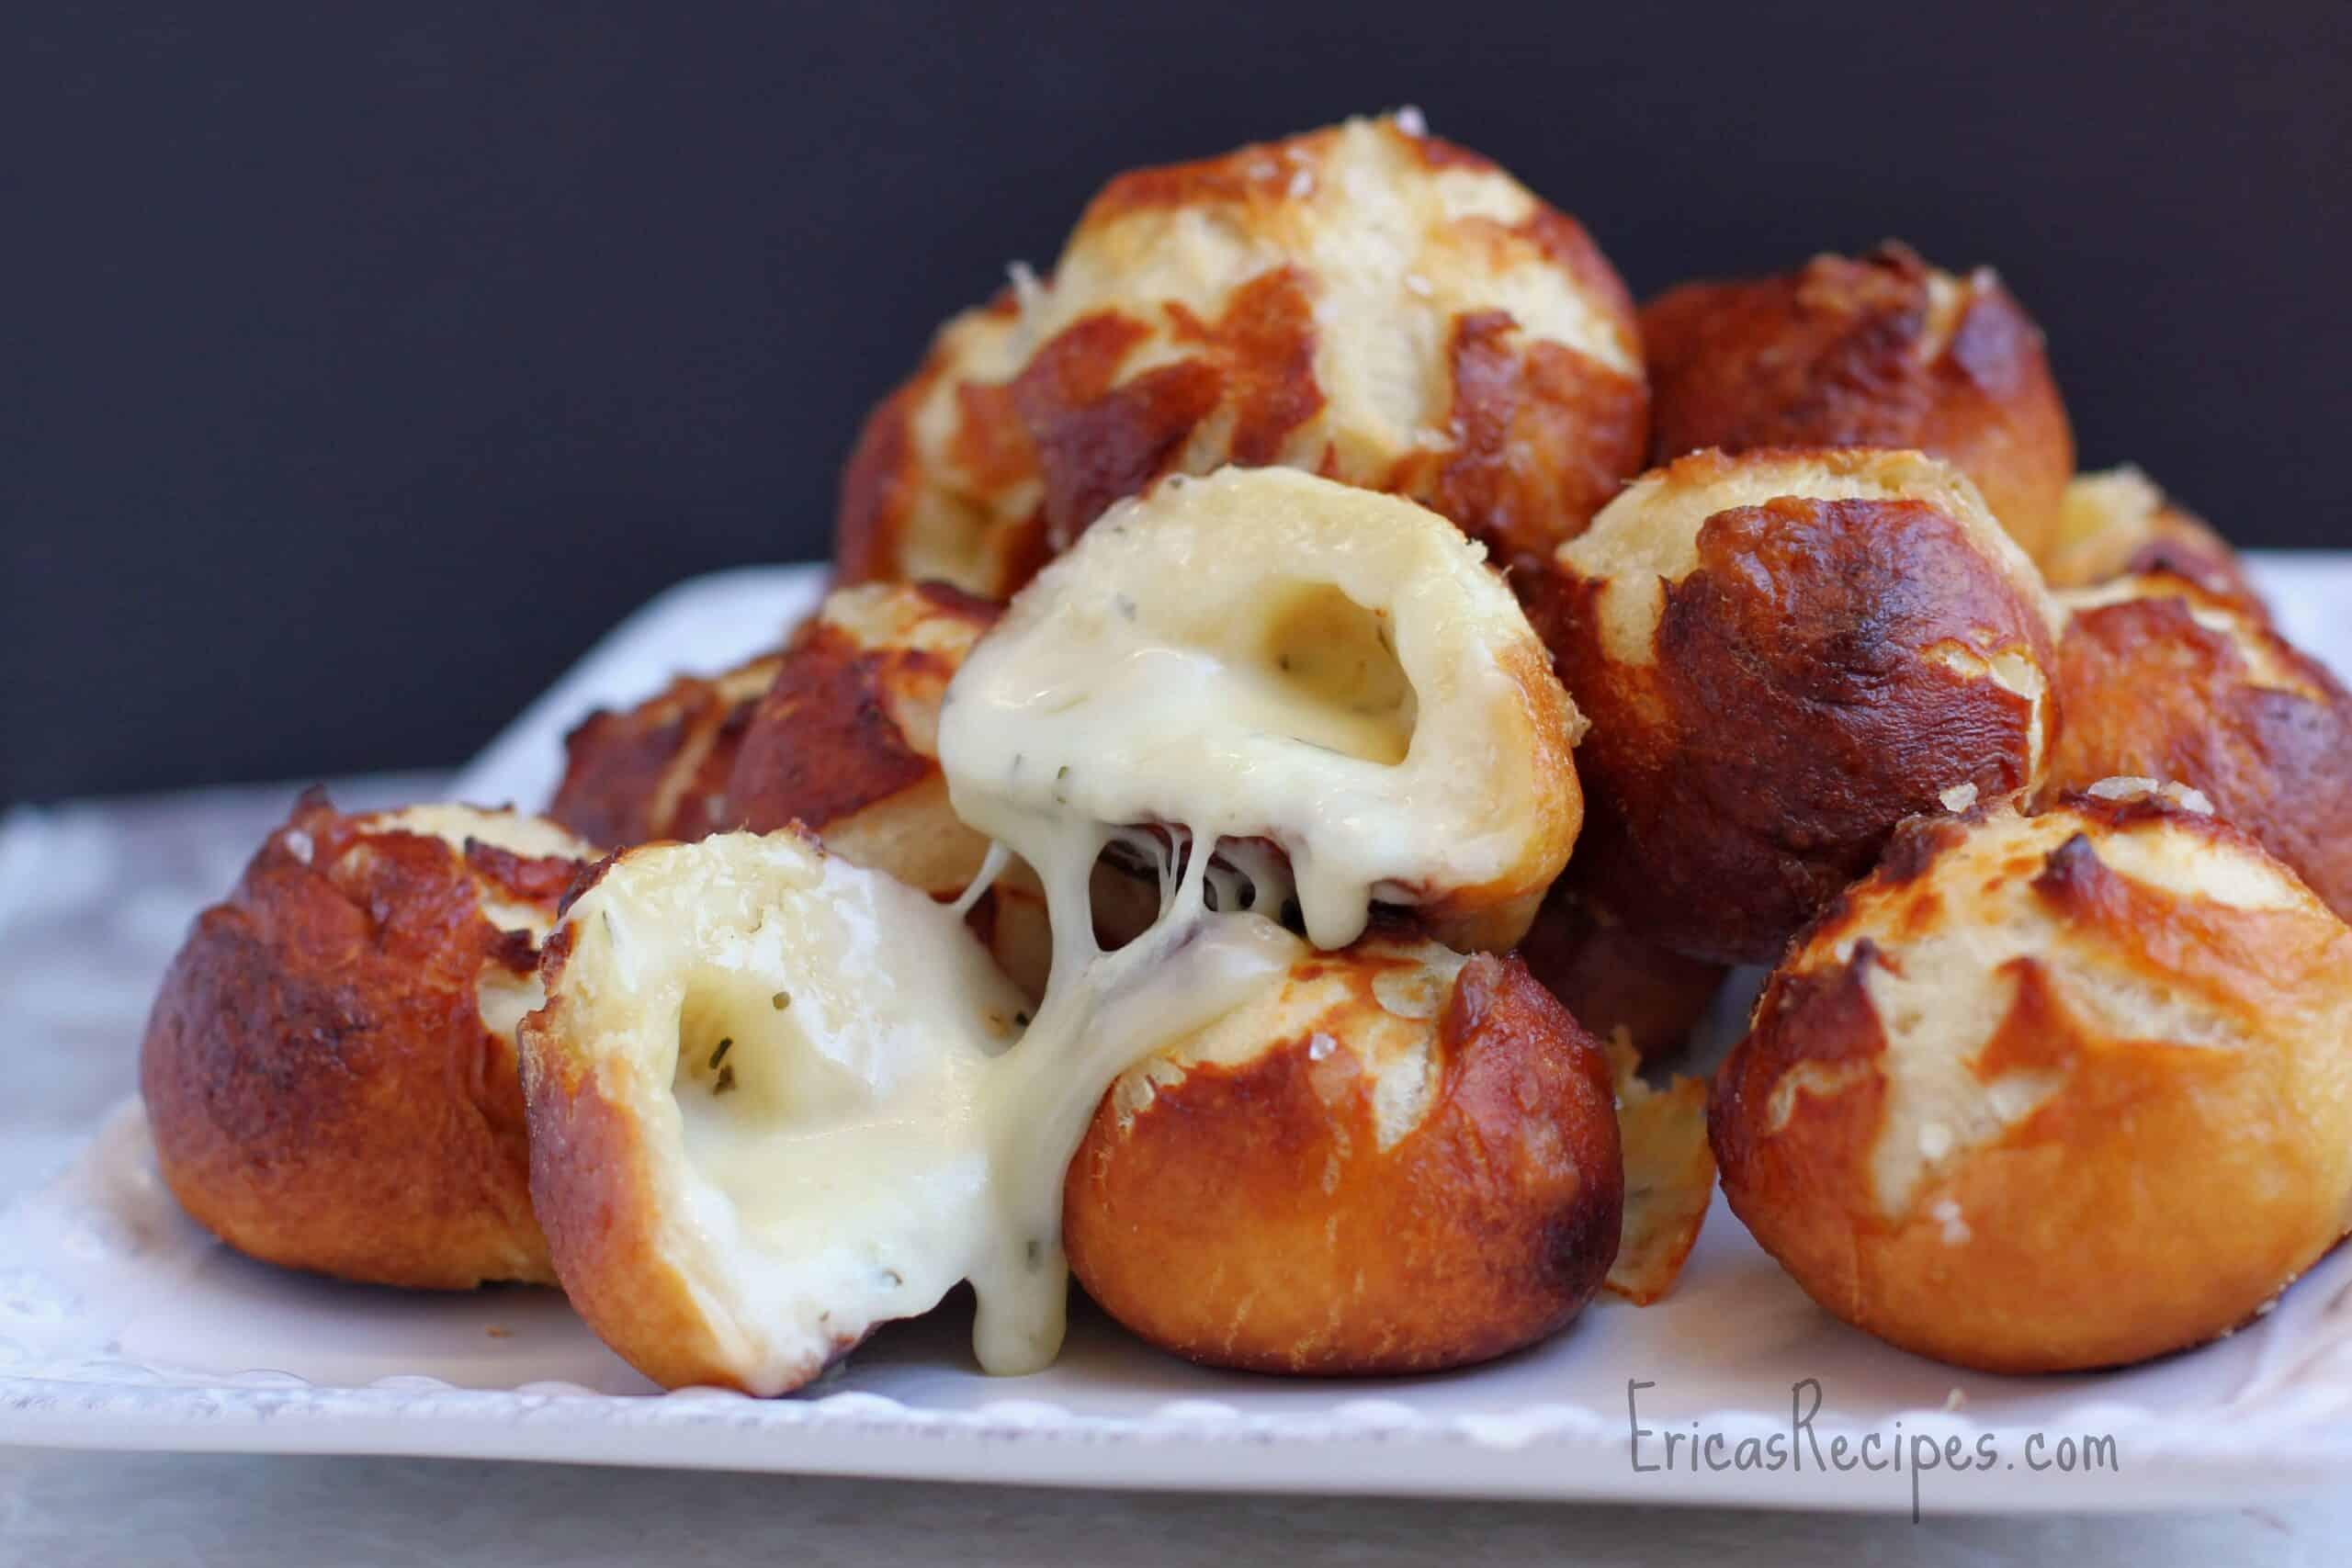 and Tomato Garlic Bread. Garlic Cheese-Stuffed Pretzel